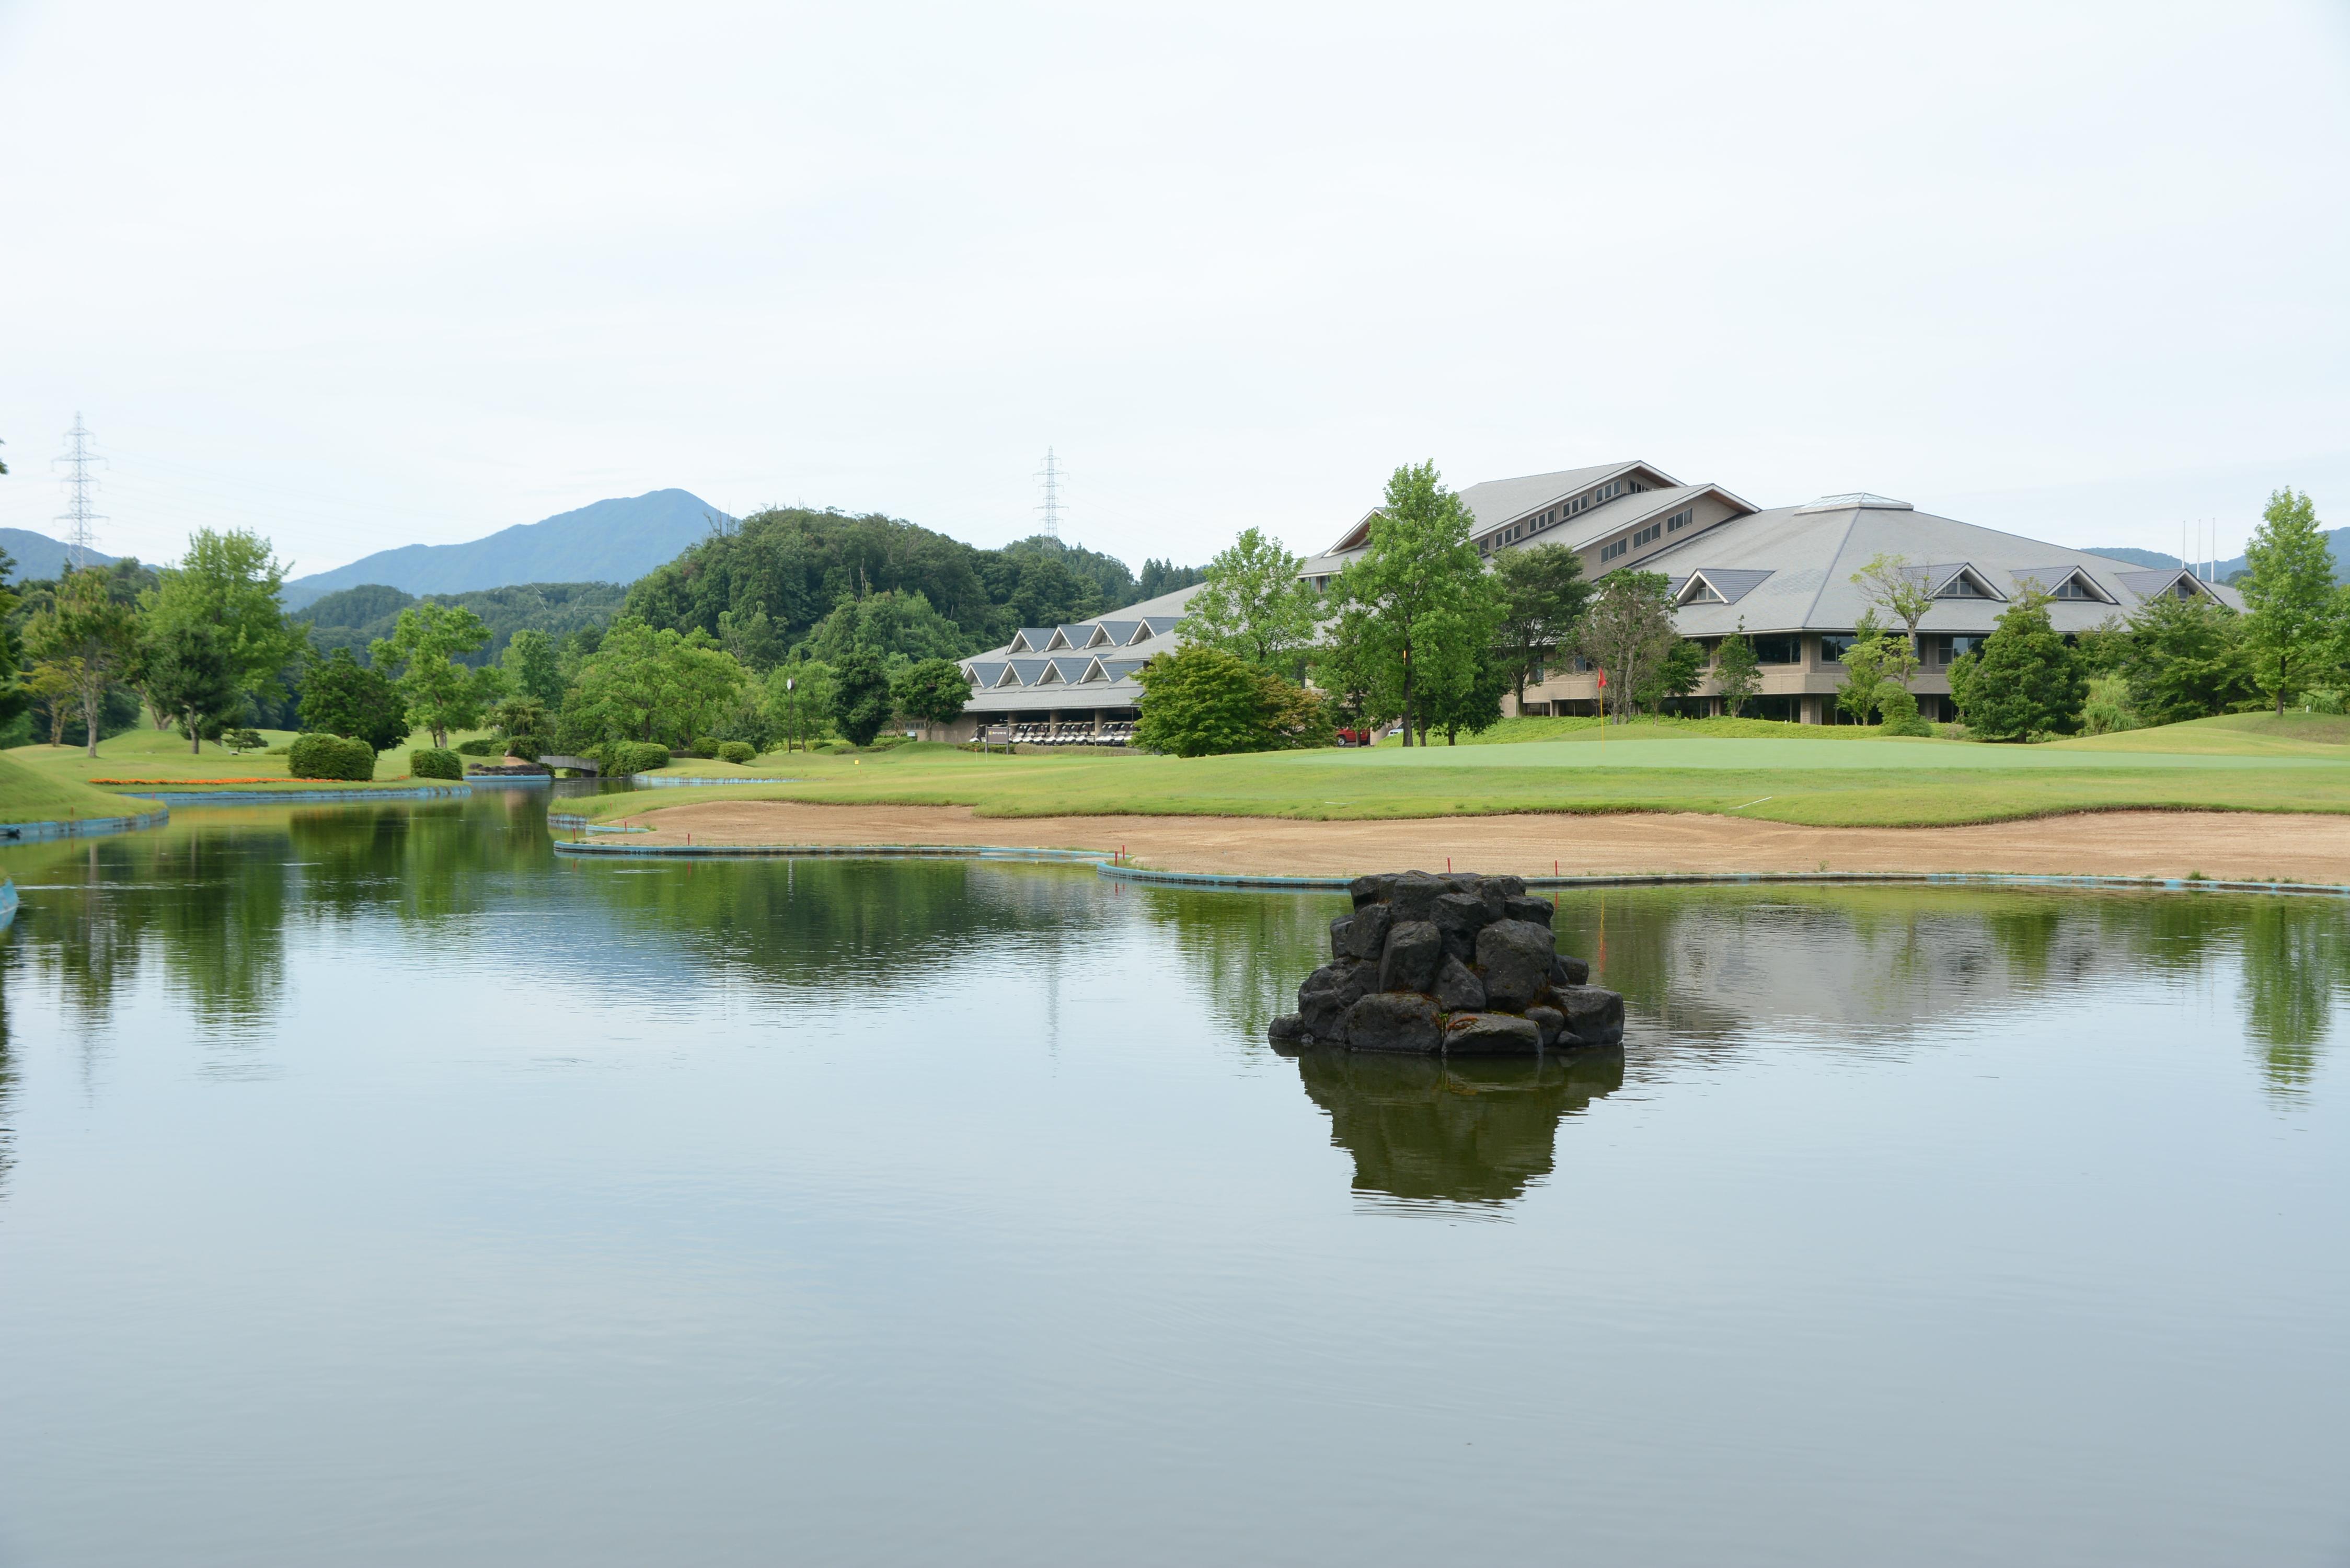 石川県・山代ゴルフ倶楽部